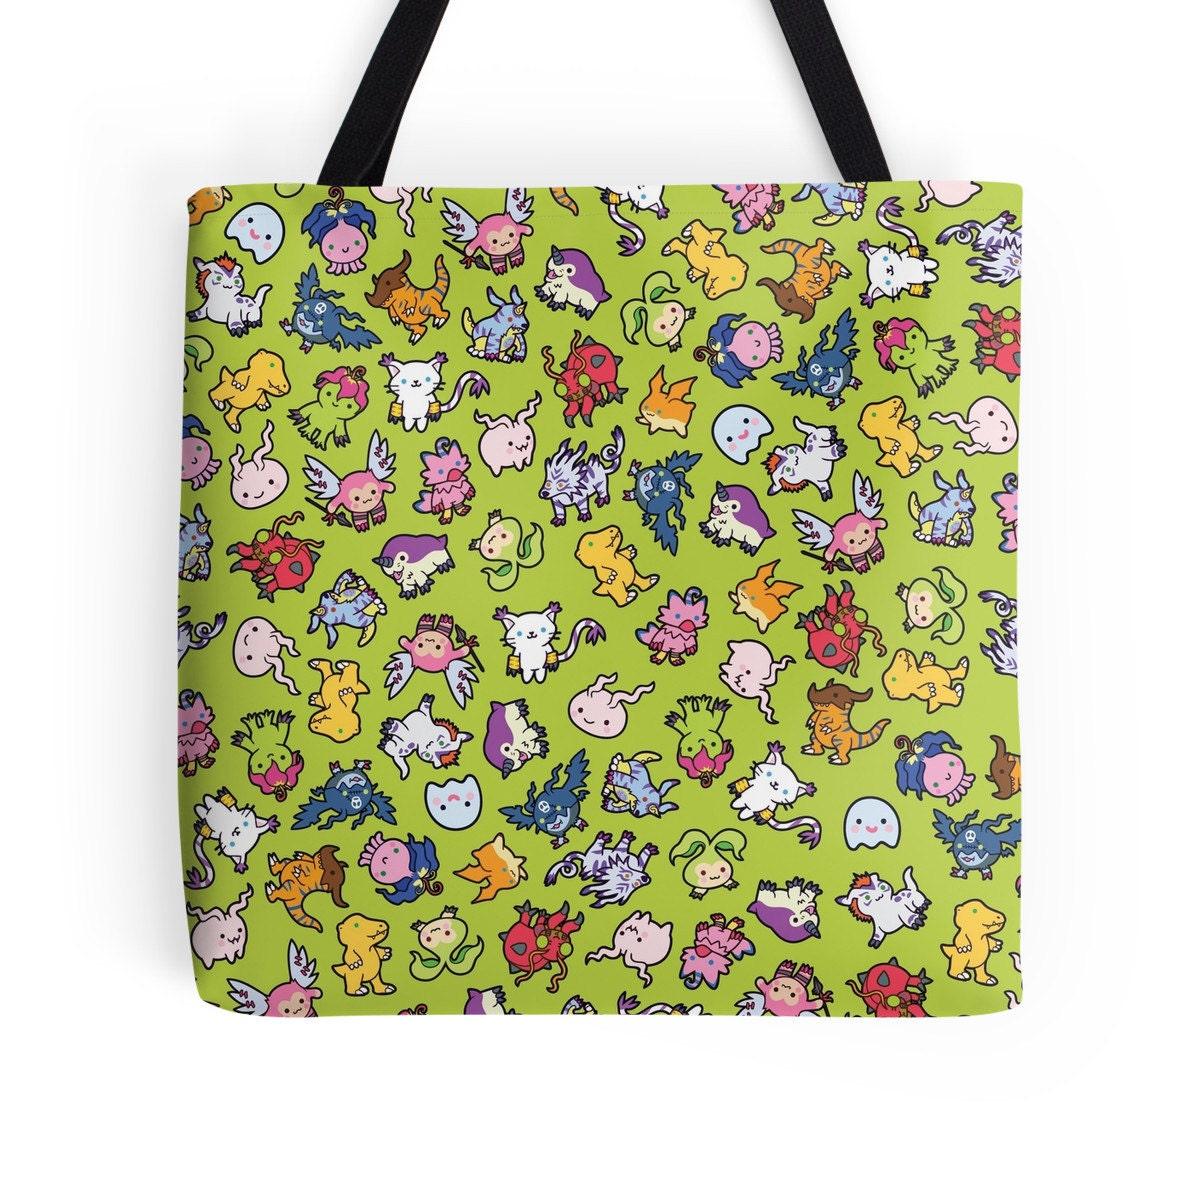 Chibi Digimon Pattern  Digimon World  Polyester Premium Tote Bag